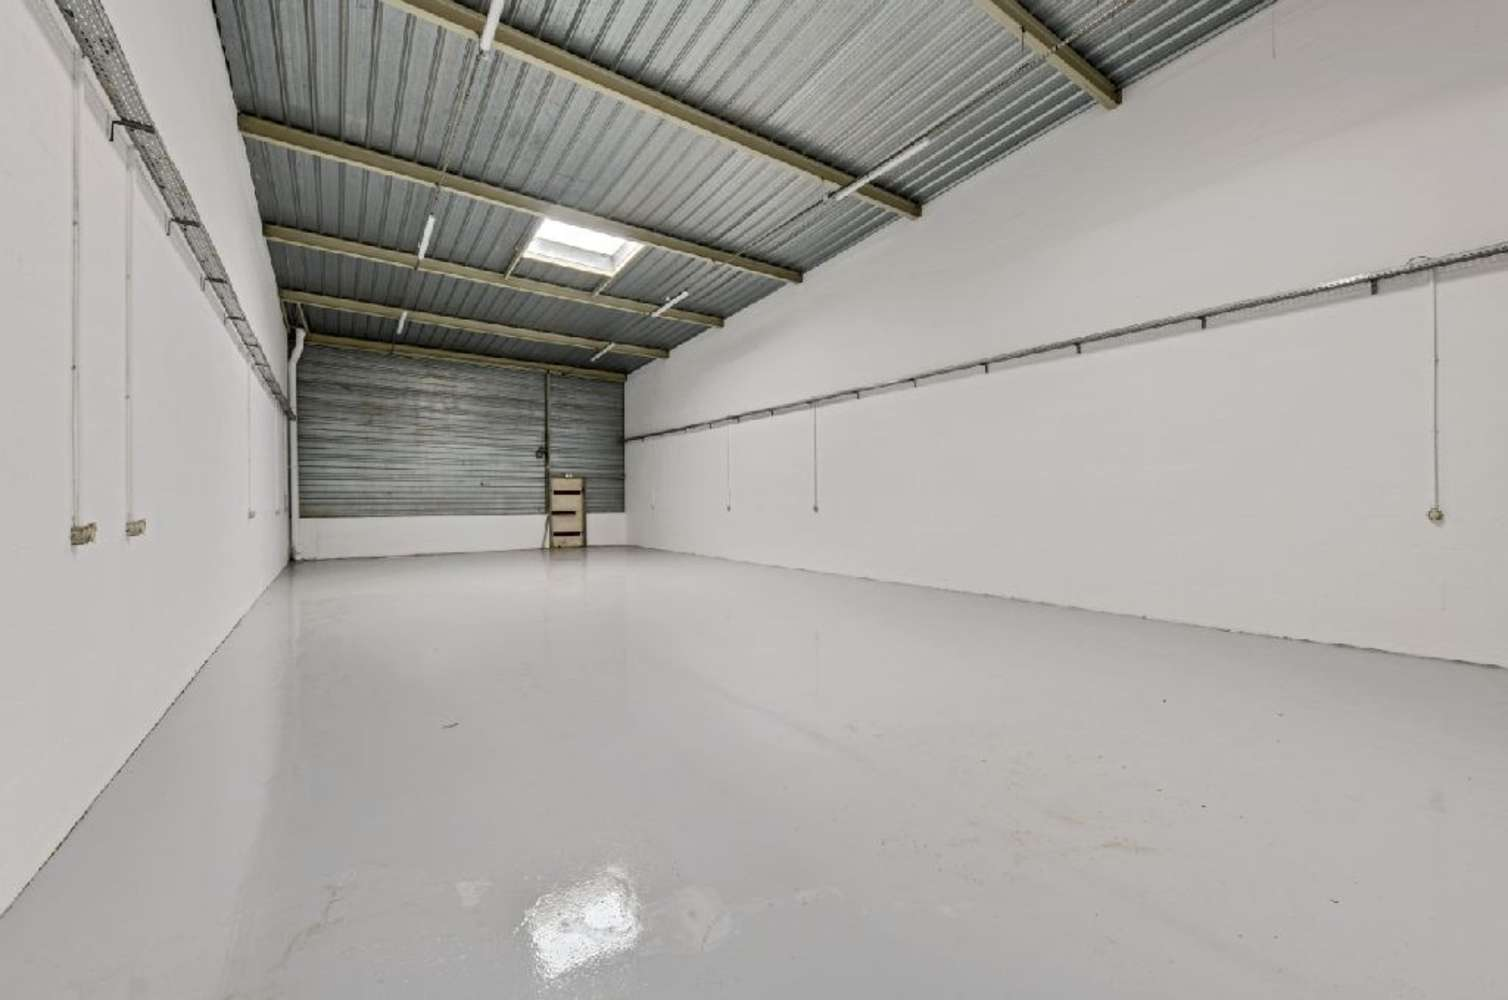 Activités/entrepôt Chilly mazarin, 91380 - IDF SUD / POLE D'ORLY - 9586535